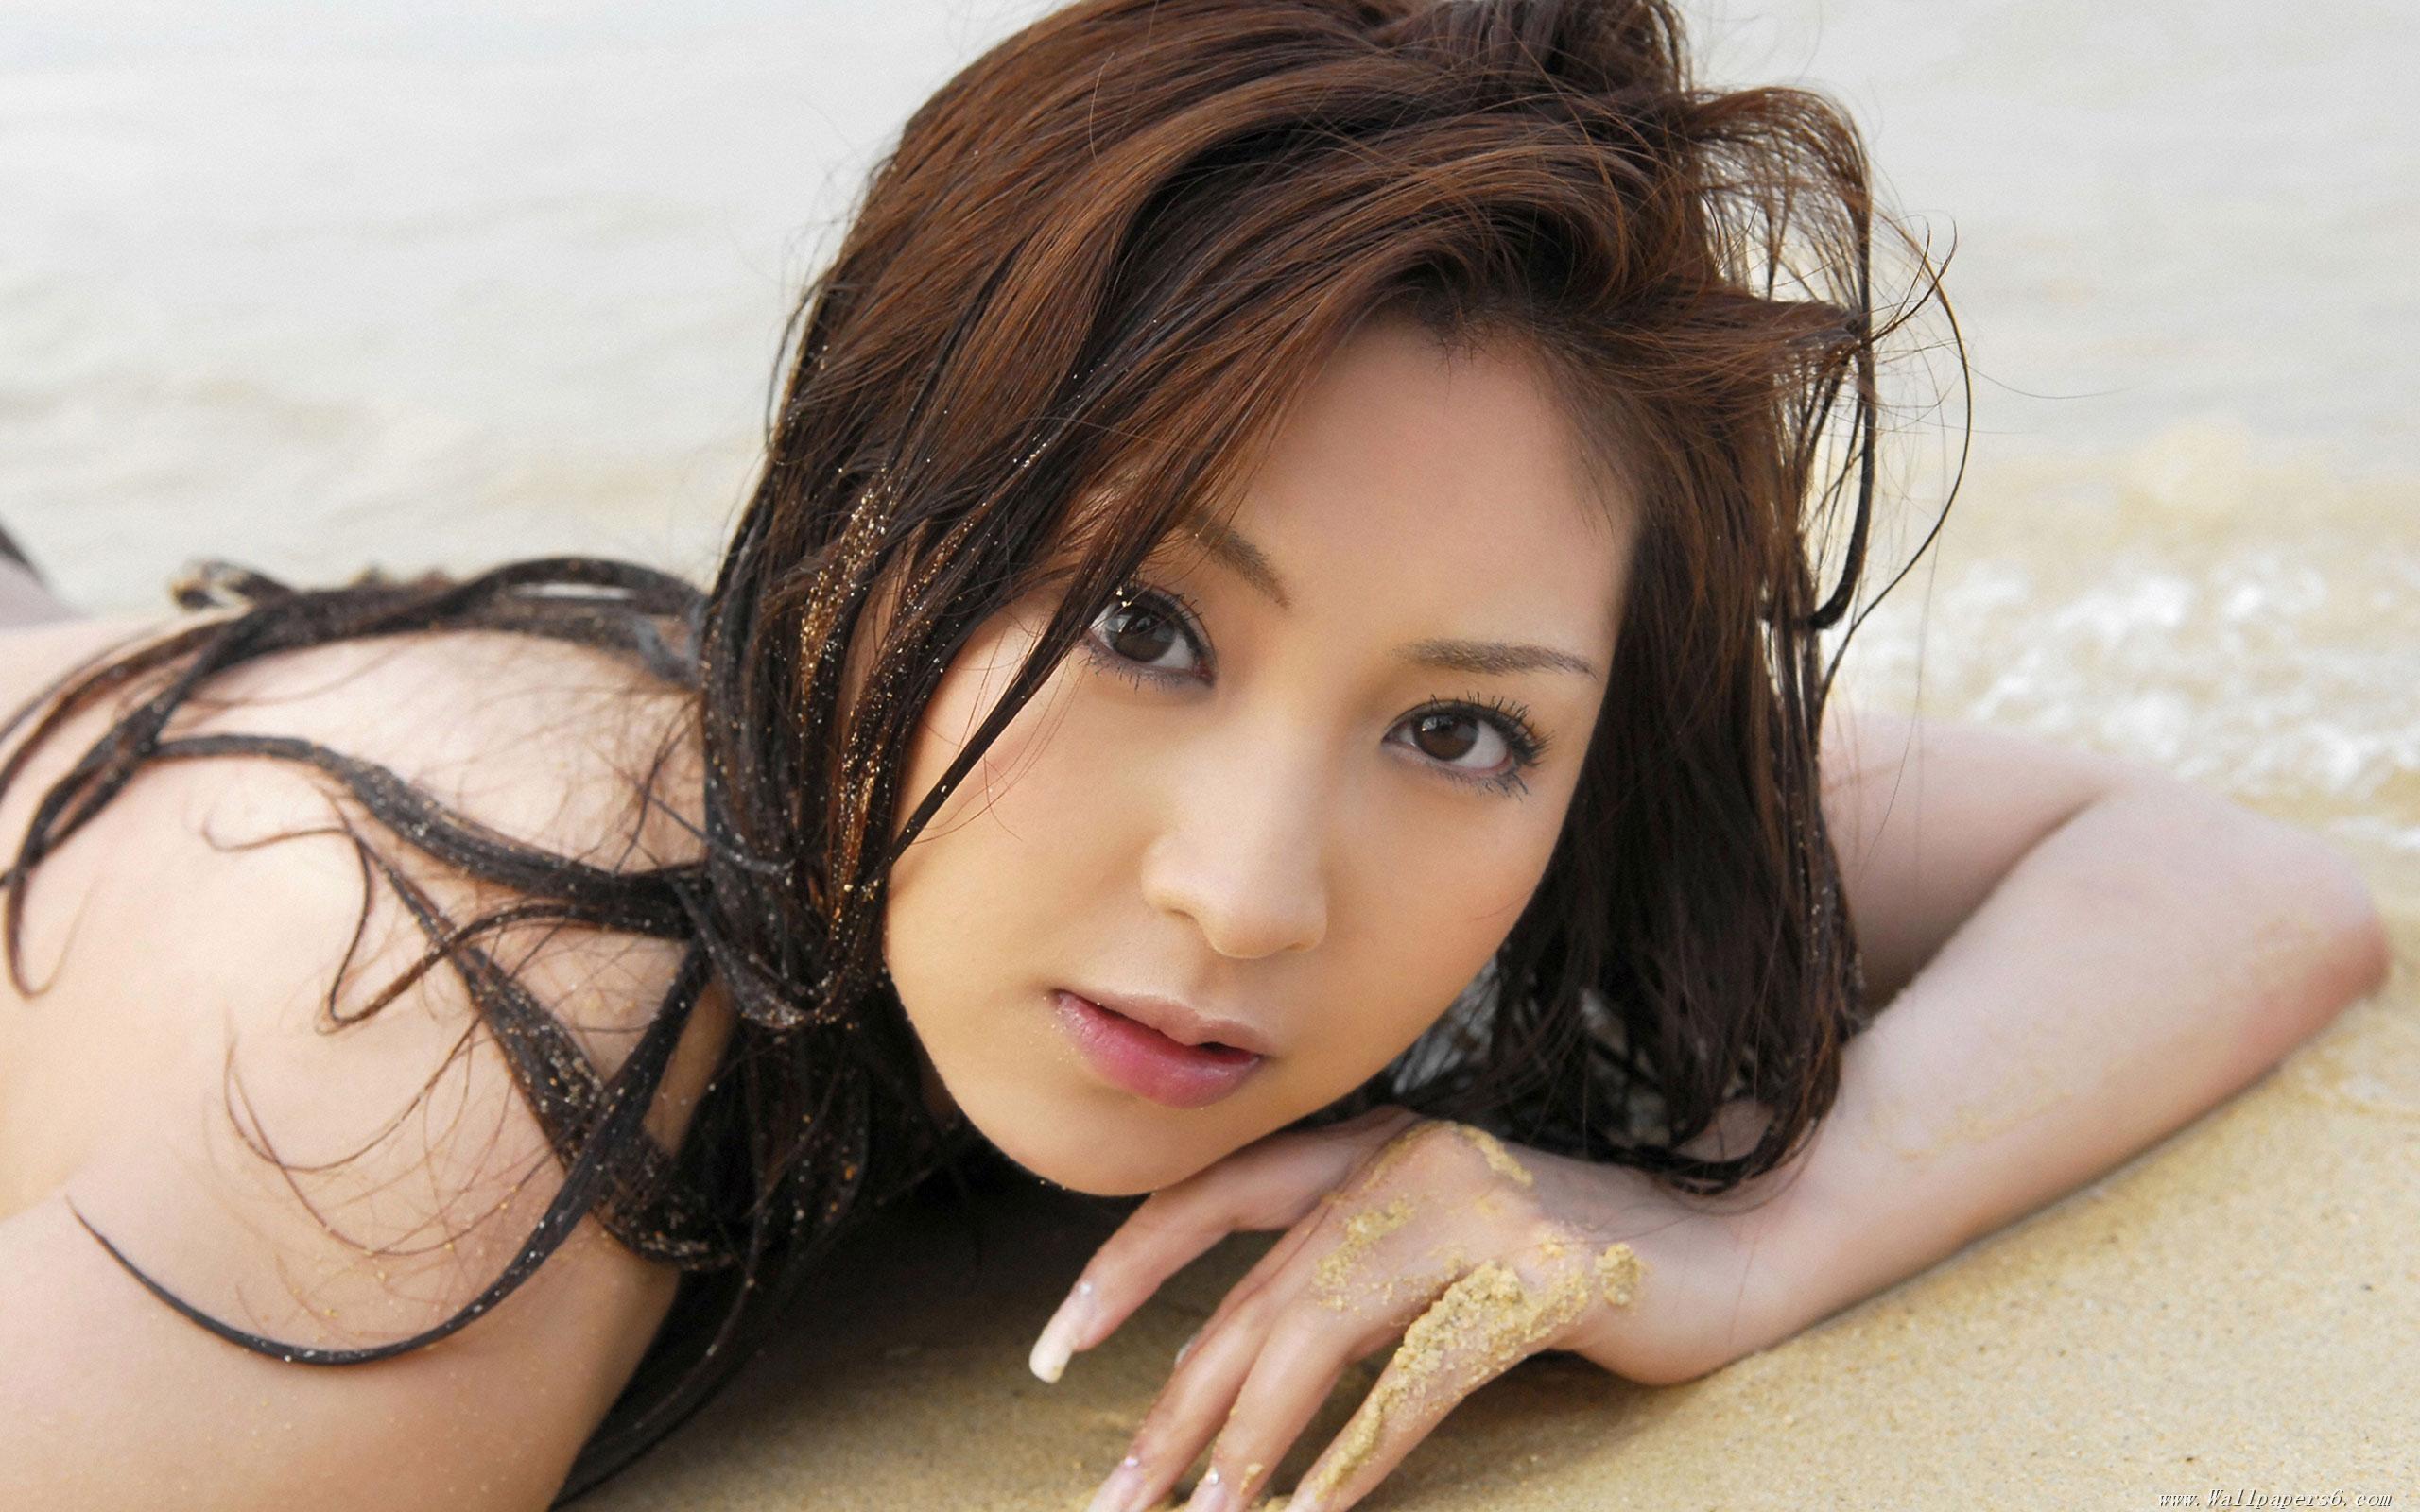 Asiáticas bañándose en playas - 2560x1600